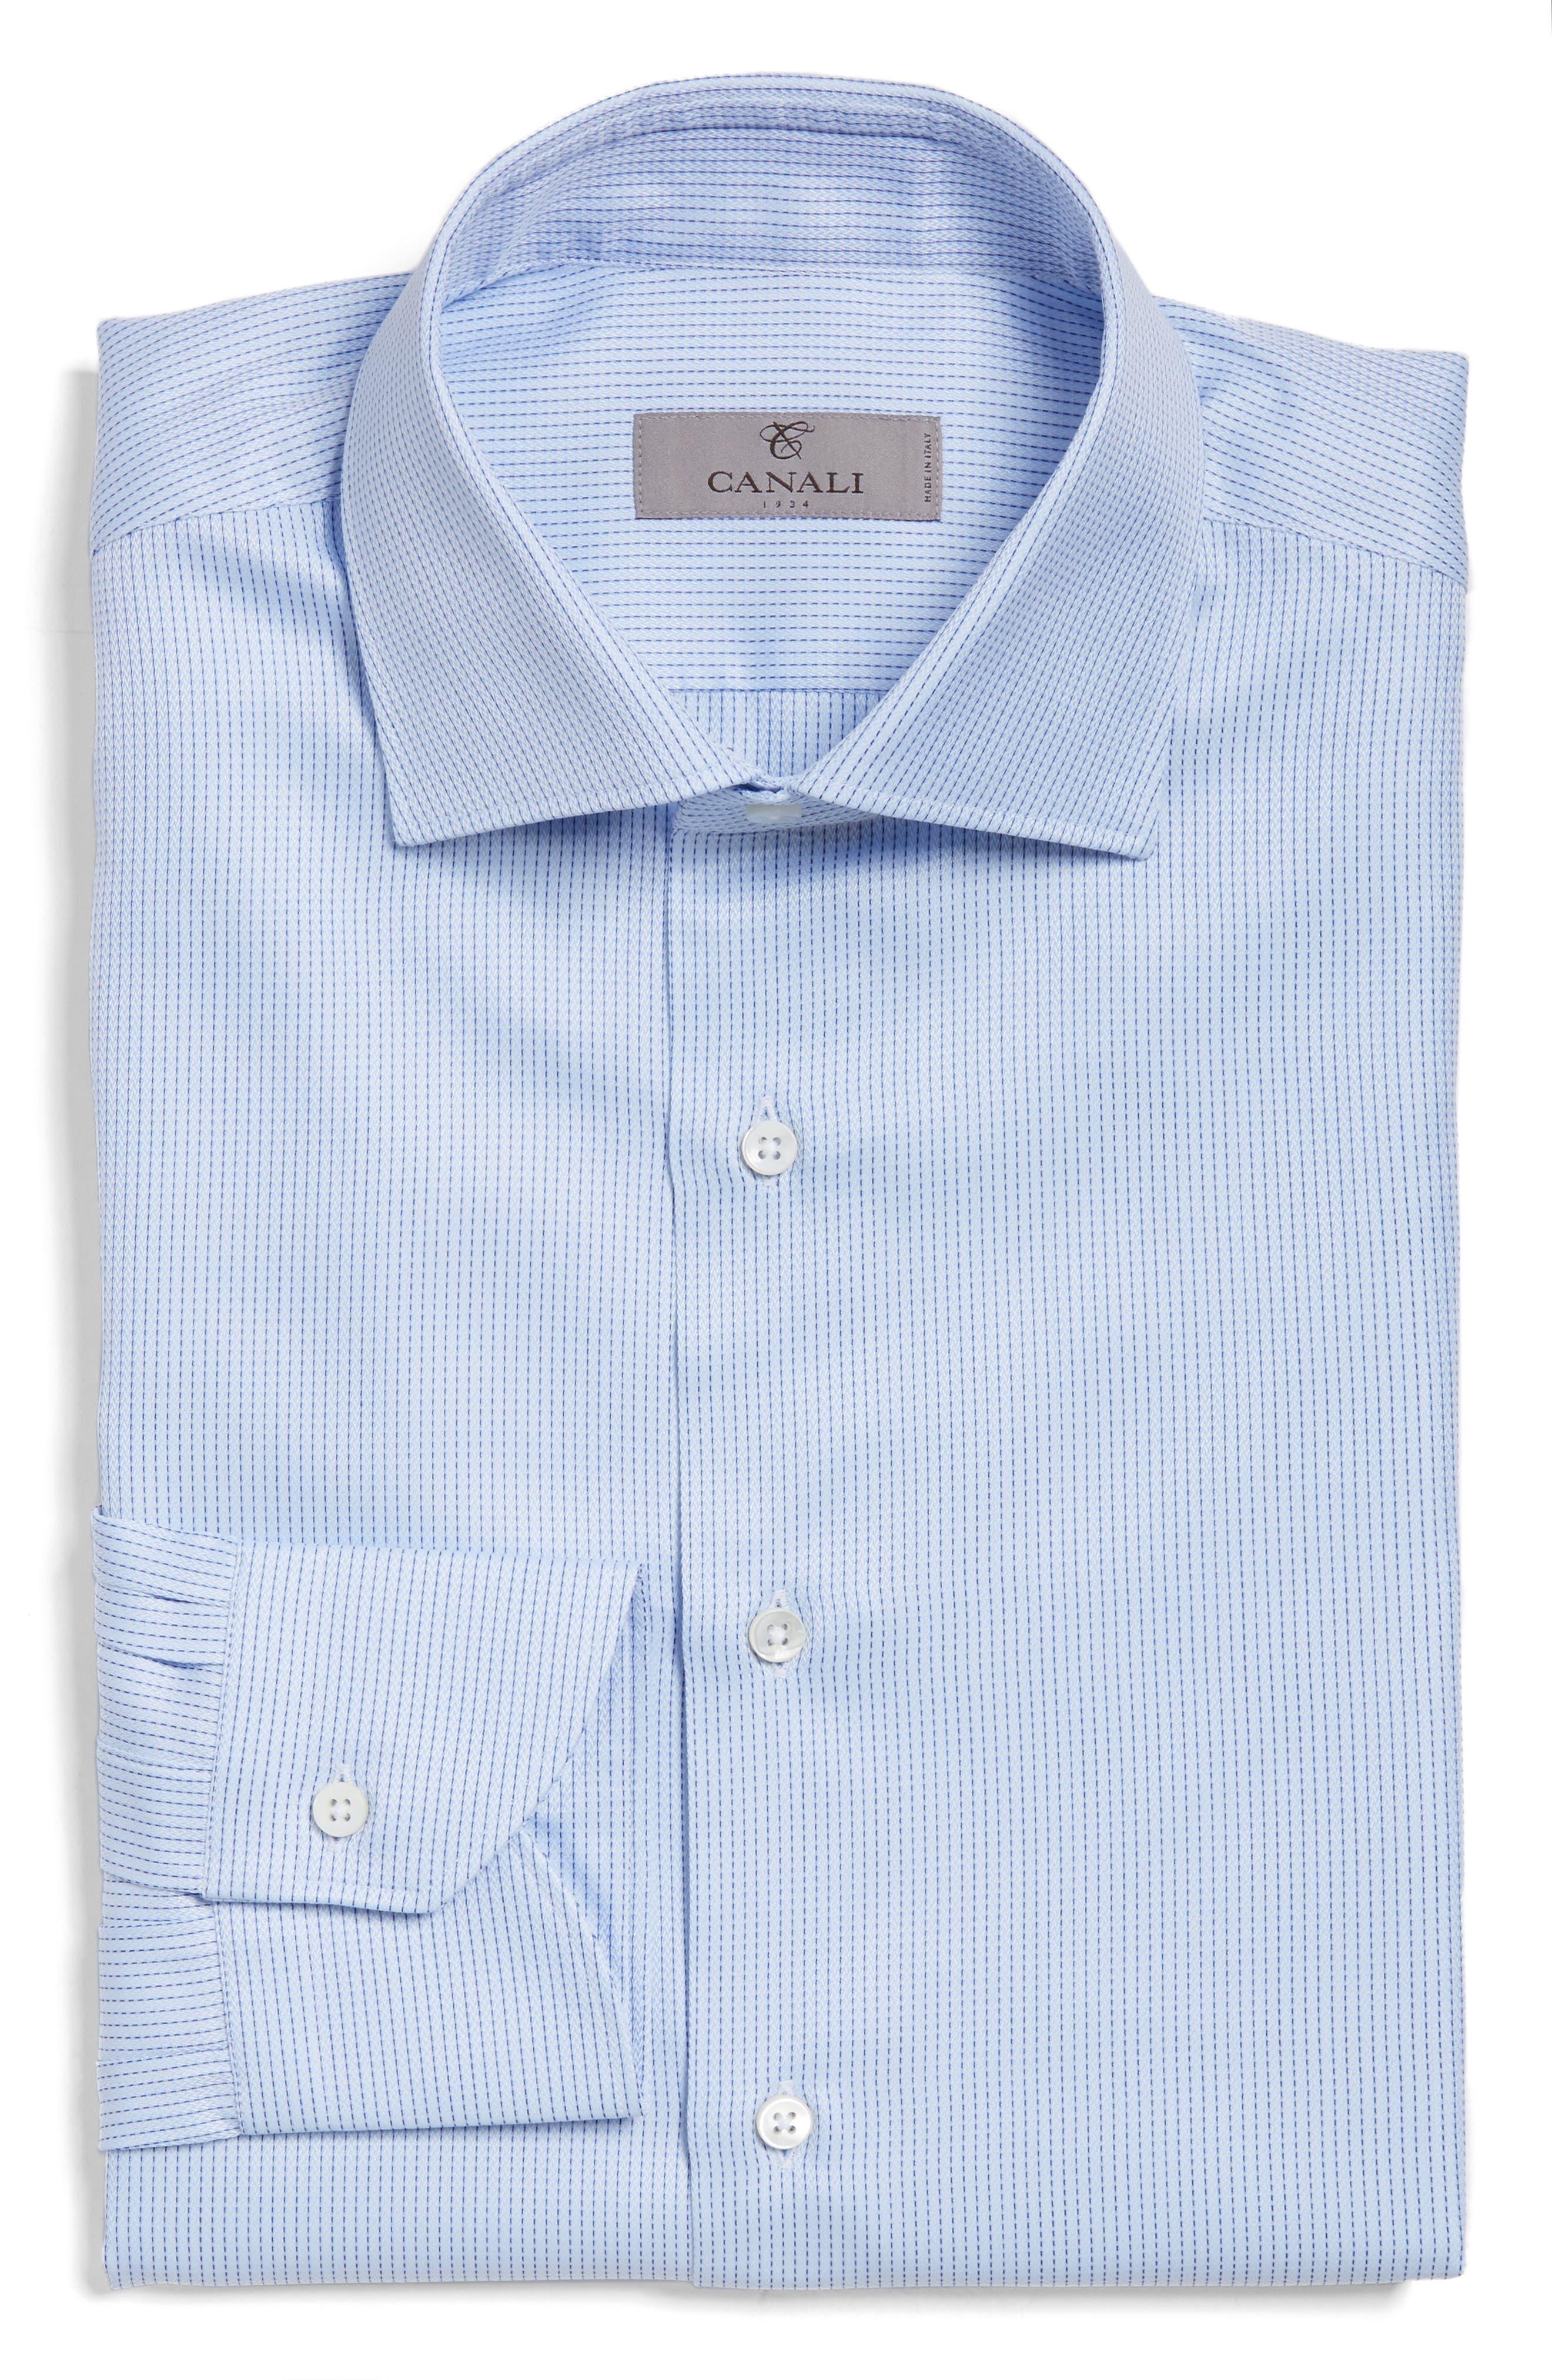 Regular Fit Stripe Dress Shirt,                             Main thumbnail 1, color,                             Light Blue